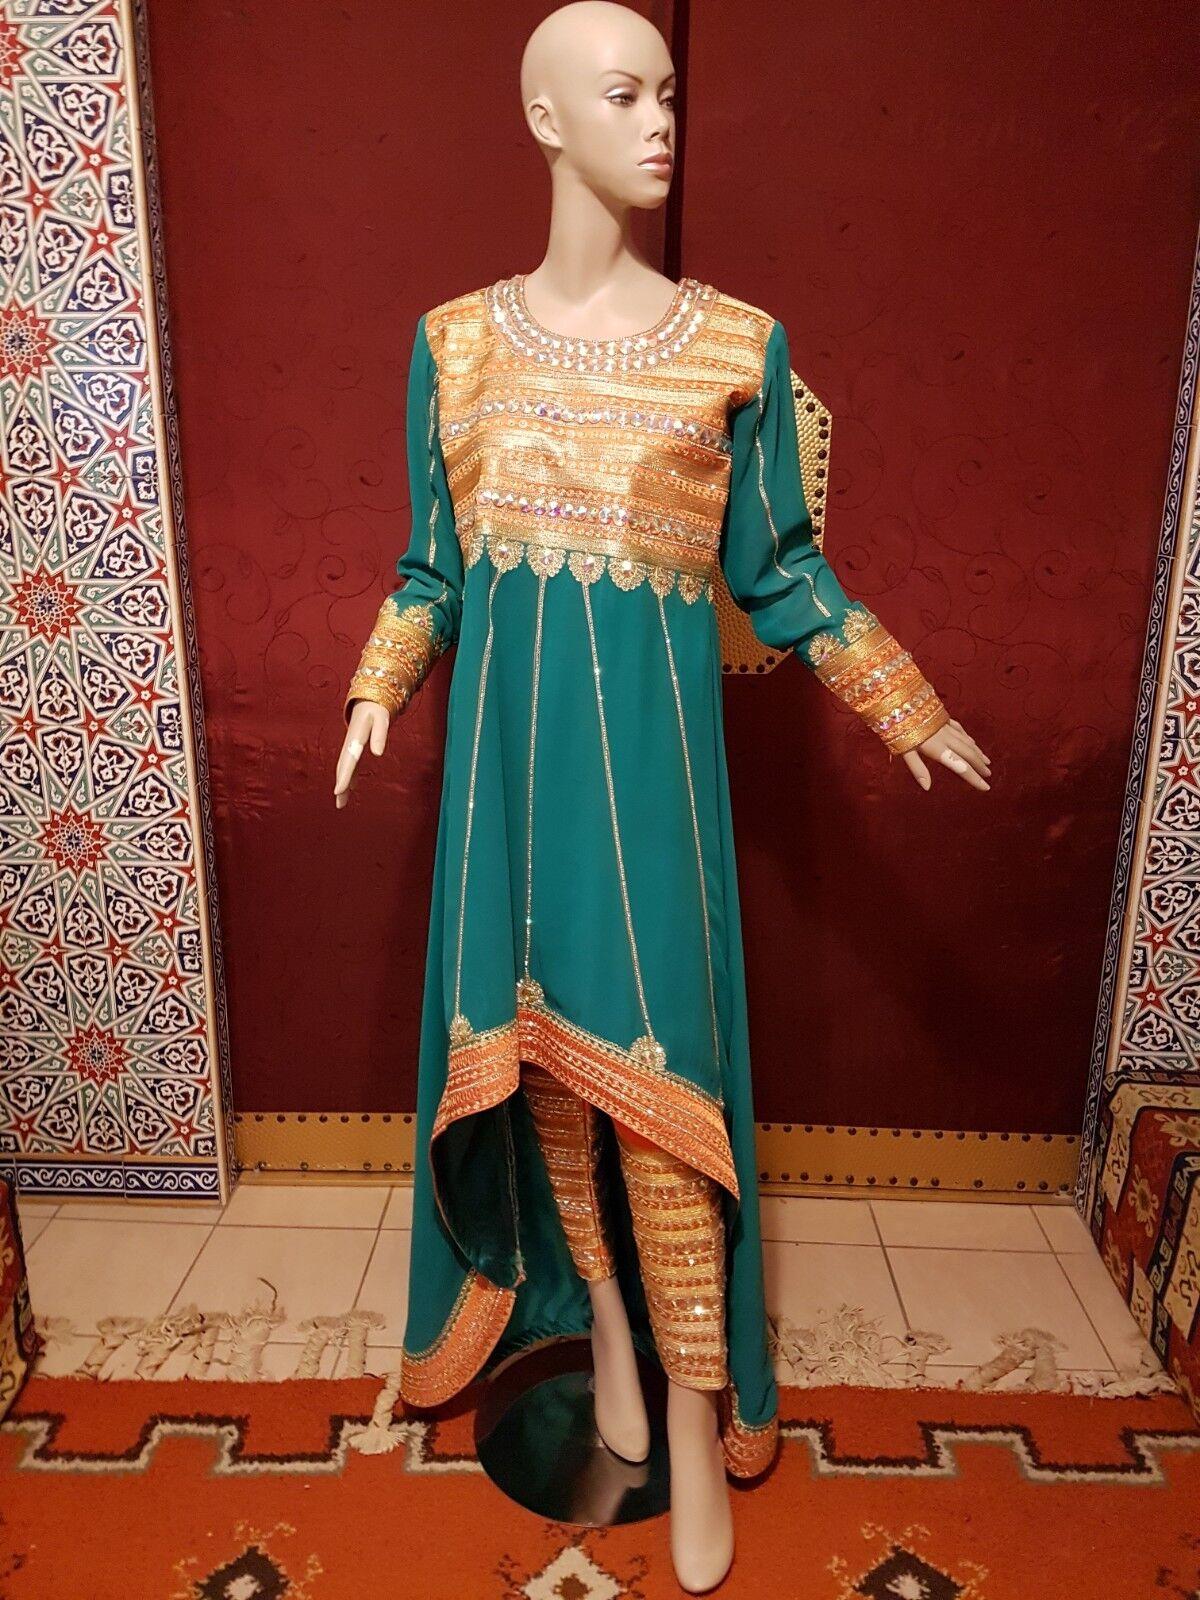 Elegantes Kleid aus Oman 3-Teilig  Original Tracht - Länge 155cm Schulter 40cm